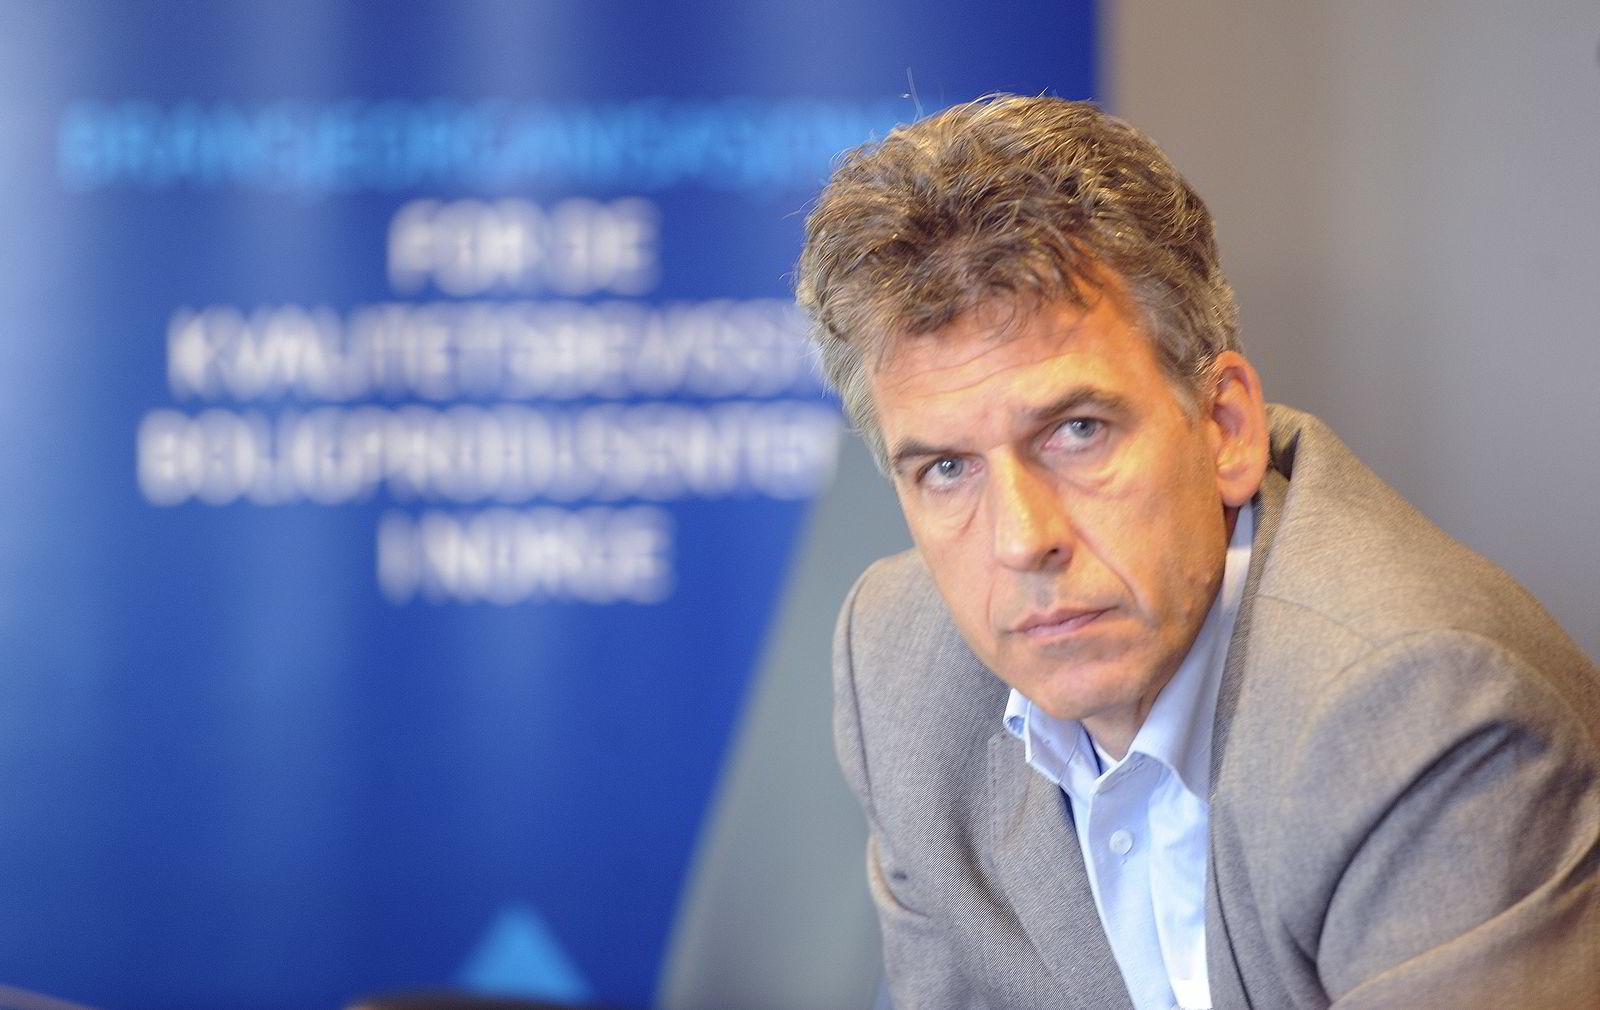 Administrerende direktør Bjørn Birkeland i Prognosesenteret. Foto: Terje Pedersen/